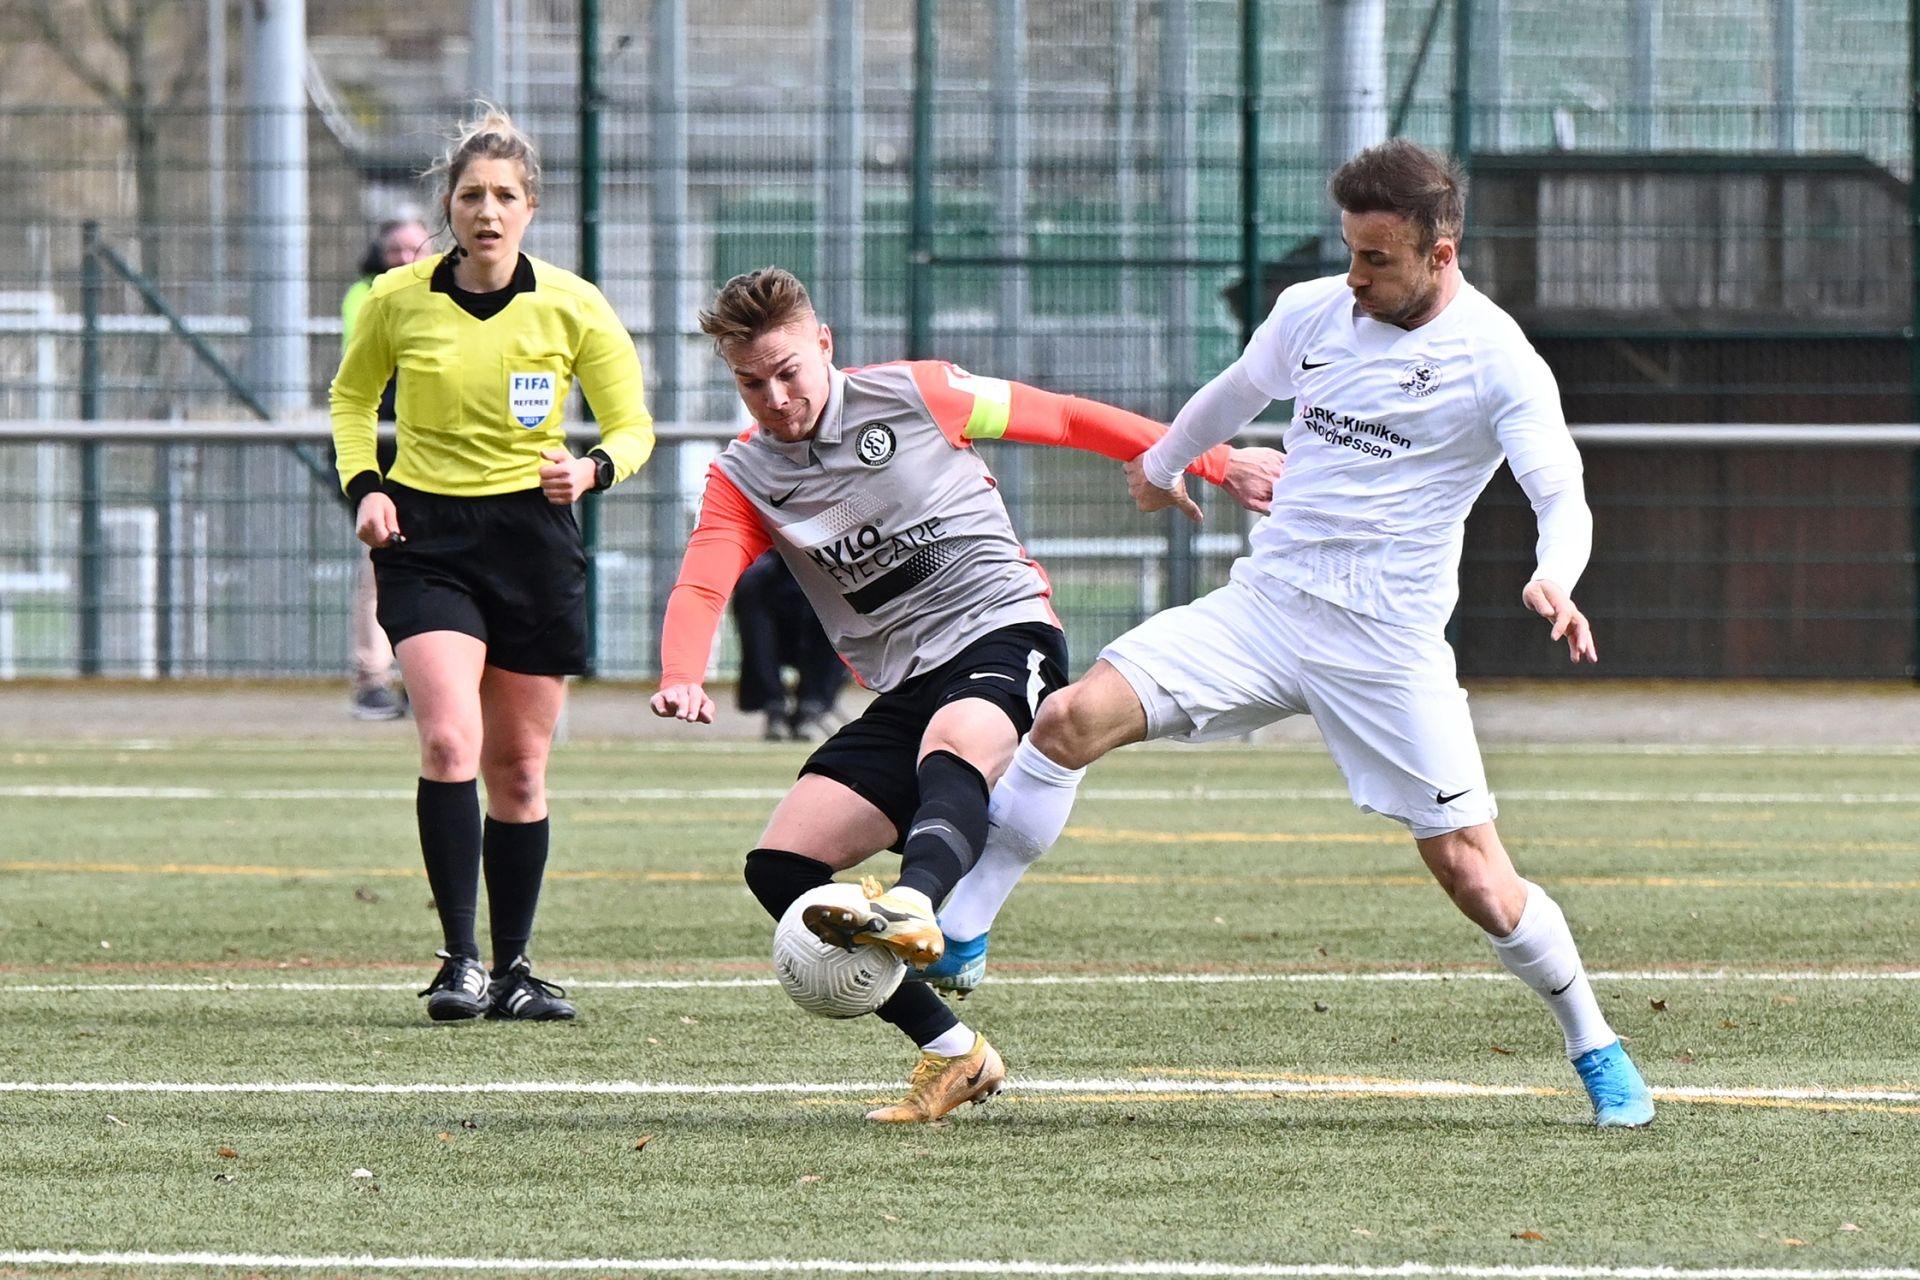 Regionalliga Südwest 2020/21, KSV Hessen Kassel, SV Elversberg, Endstand 0:2, Meha